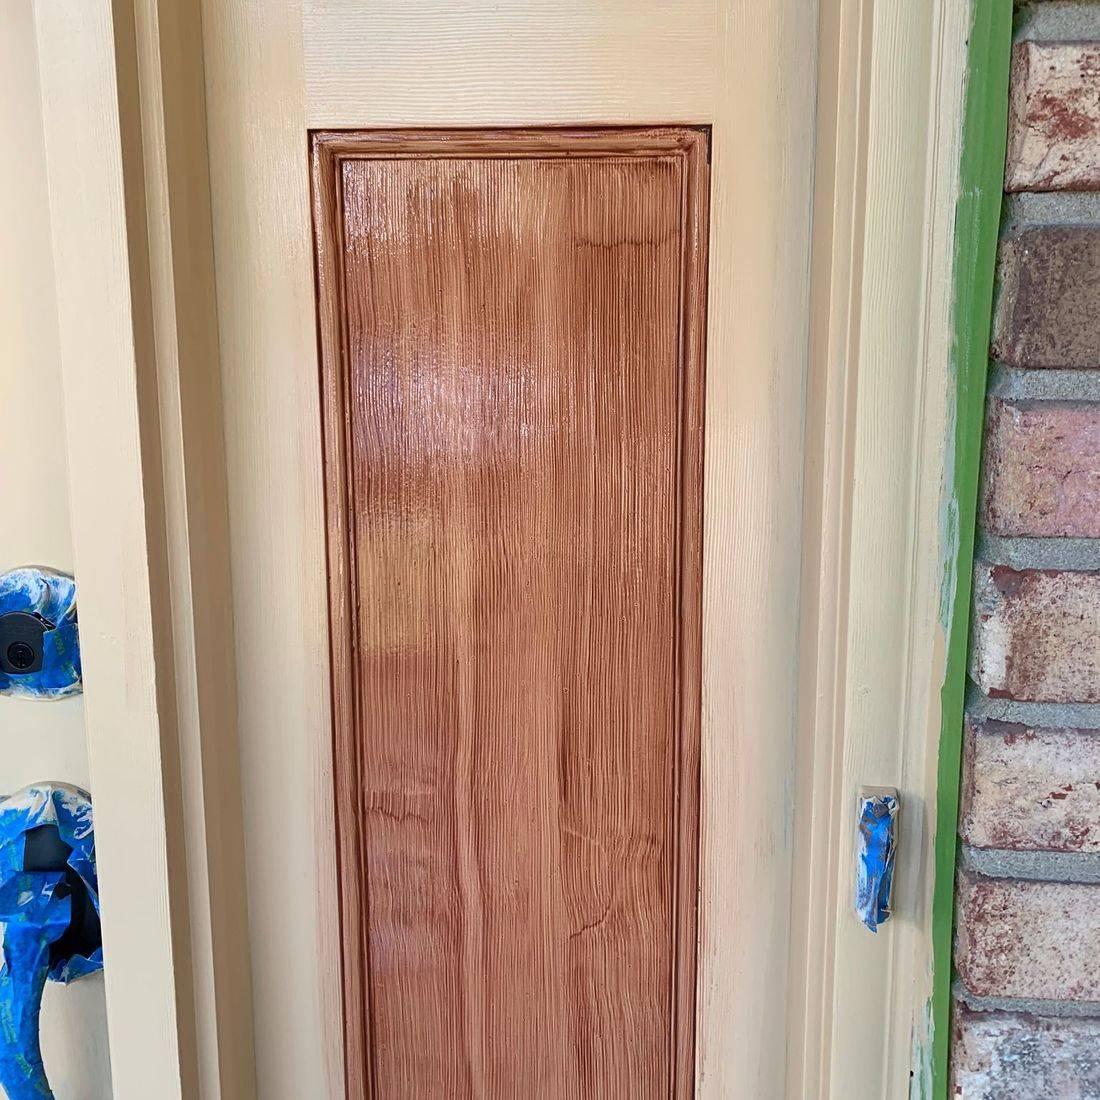 cabinet painting, refinishing, cabinet resurfacing, kitchen cabinet painting, custom painting, cincinnati, ohio, scott fritz, wall creations, Cincinnati, Ohio